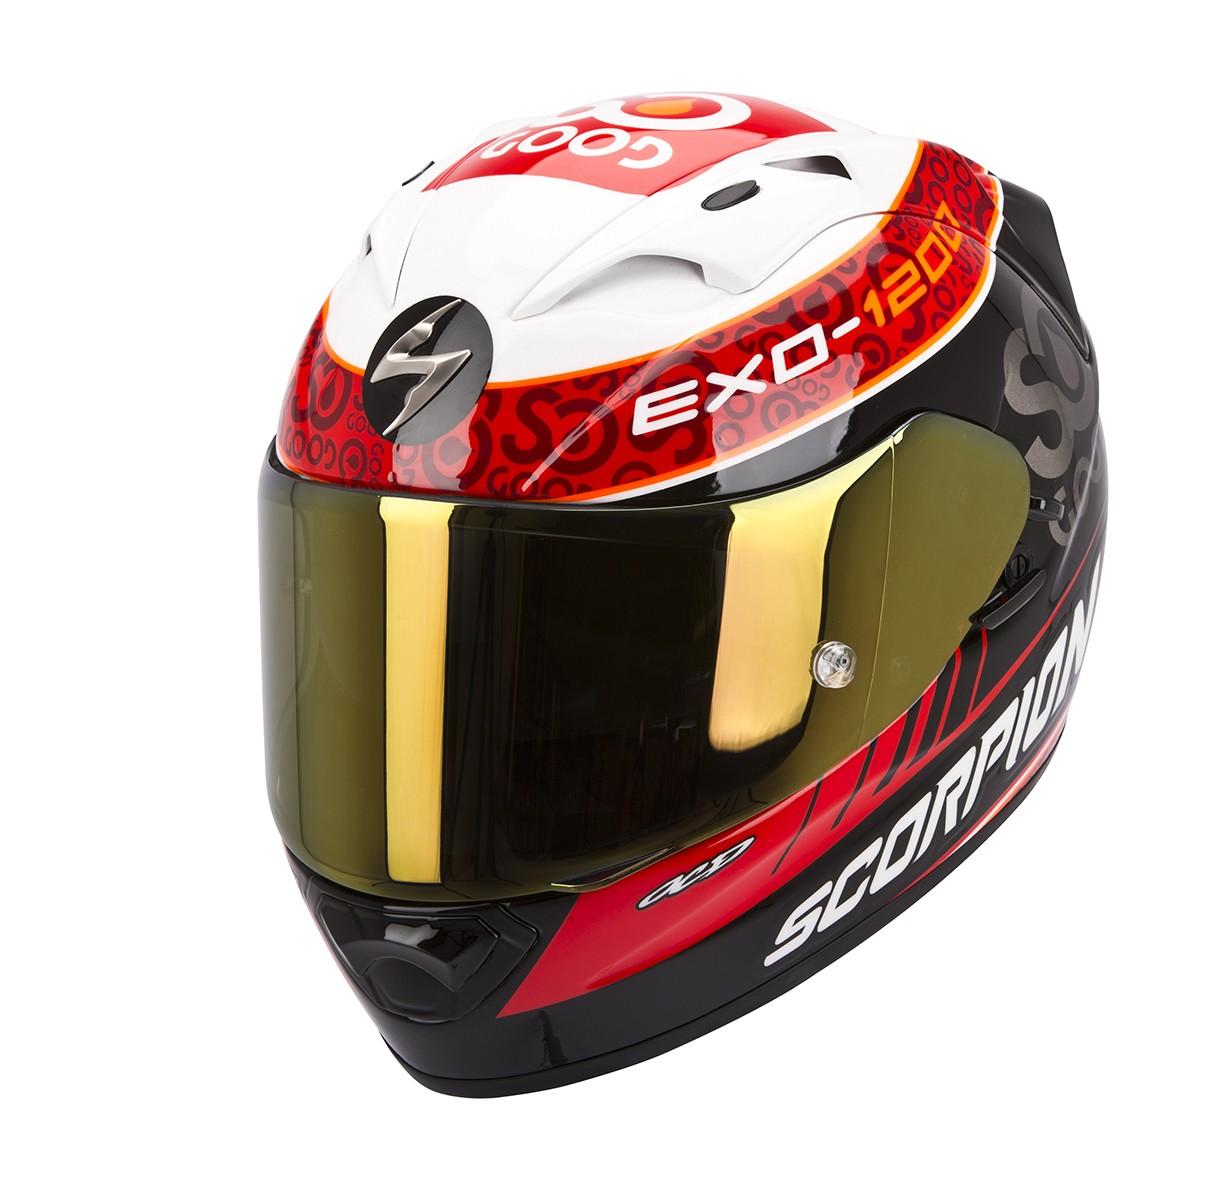 Scorpion EXO-1200 Air Helm Charpentier